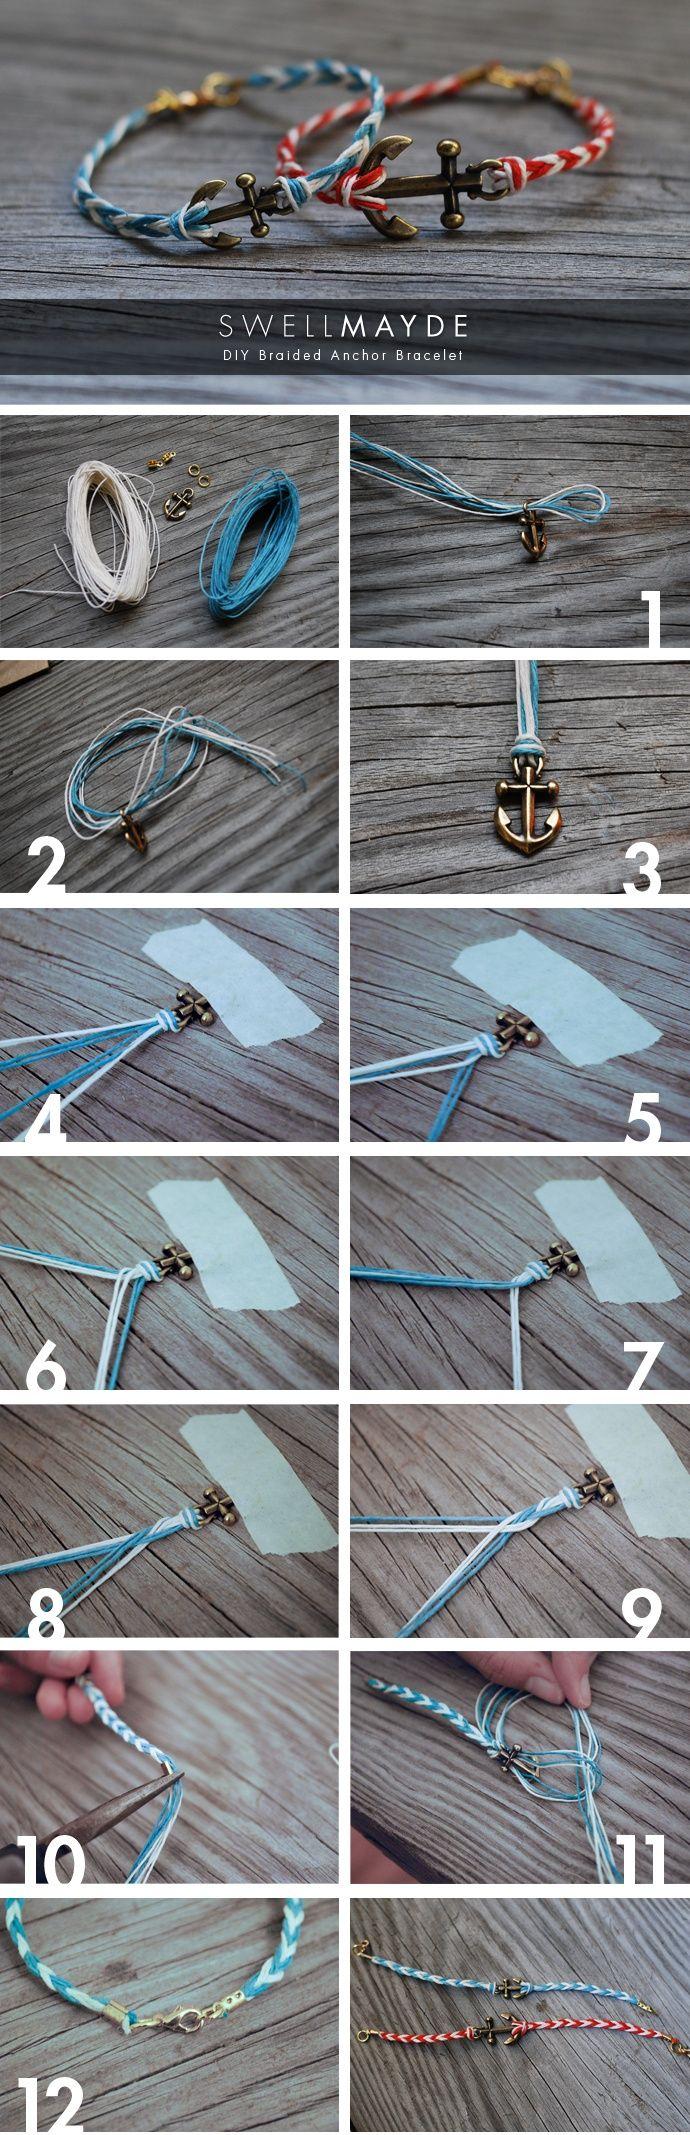 DIY Fishtail Braided Anchor Bracelet. I will do this before I go to California